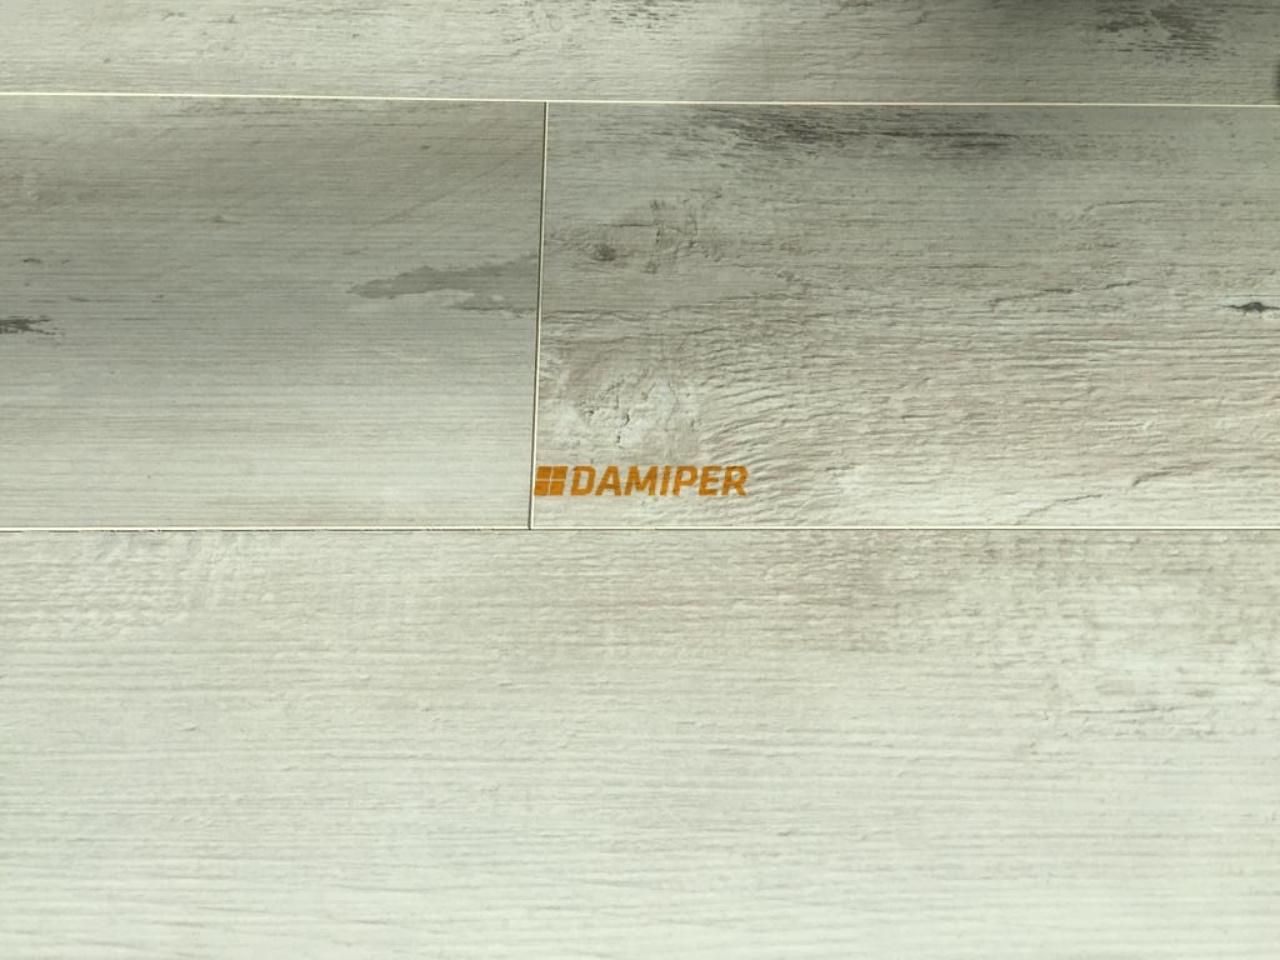 kompozitne_podlahy_h2o_floor_kronooriginal_1524_borovica_southern_damiper